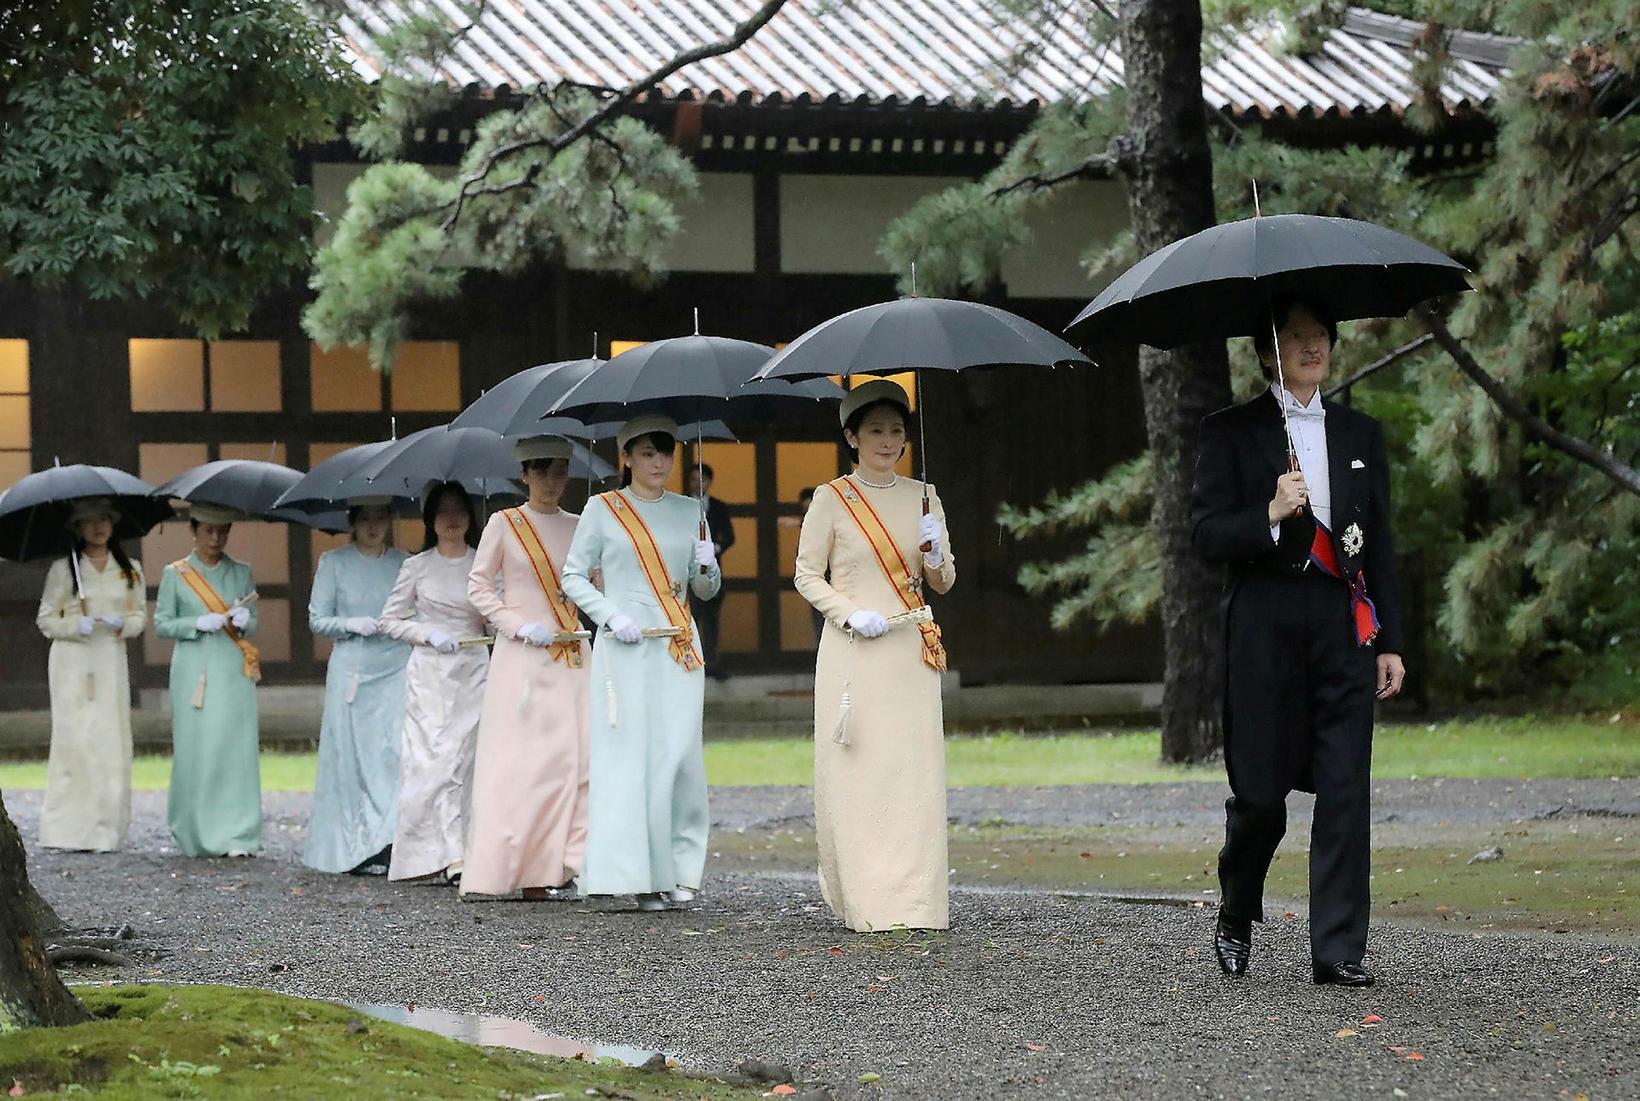 Akishino, krónprins Japans, og eiginkona hans, Kiko krónprinsessa, ganga fremst …